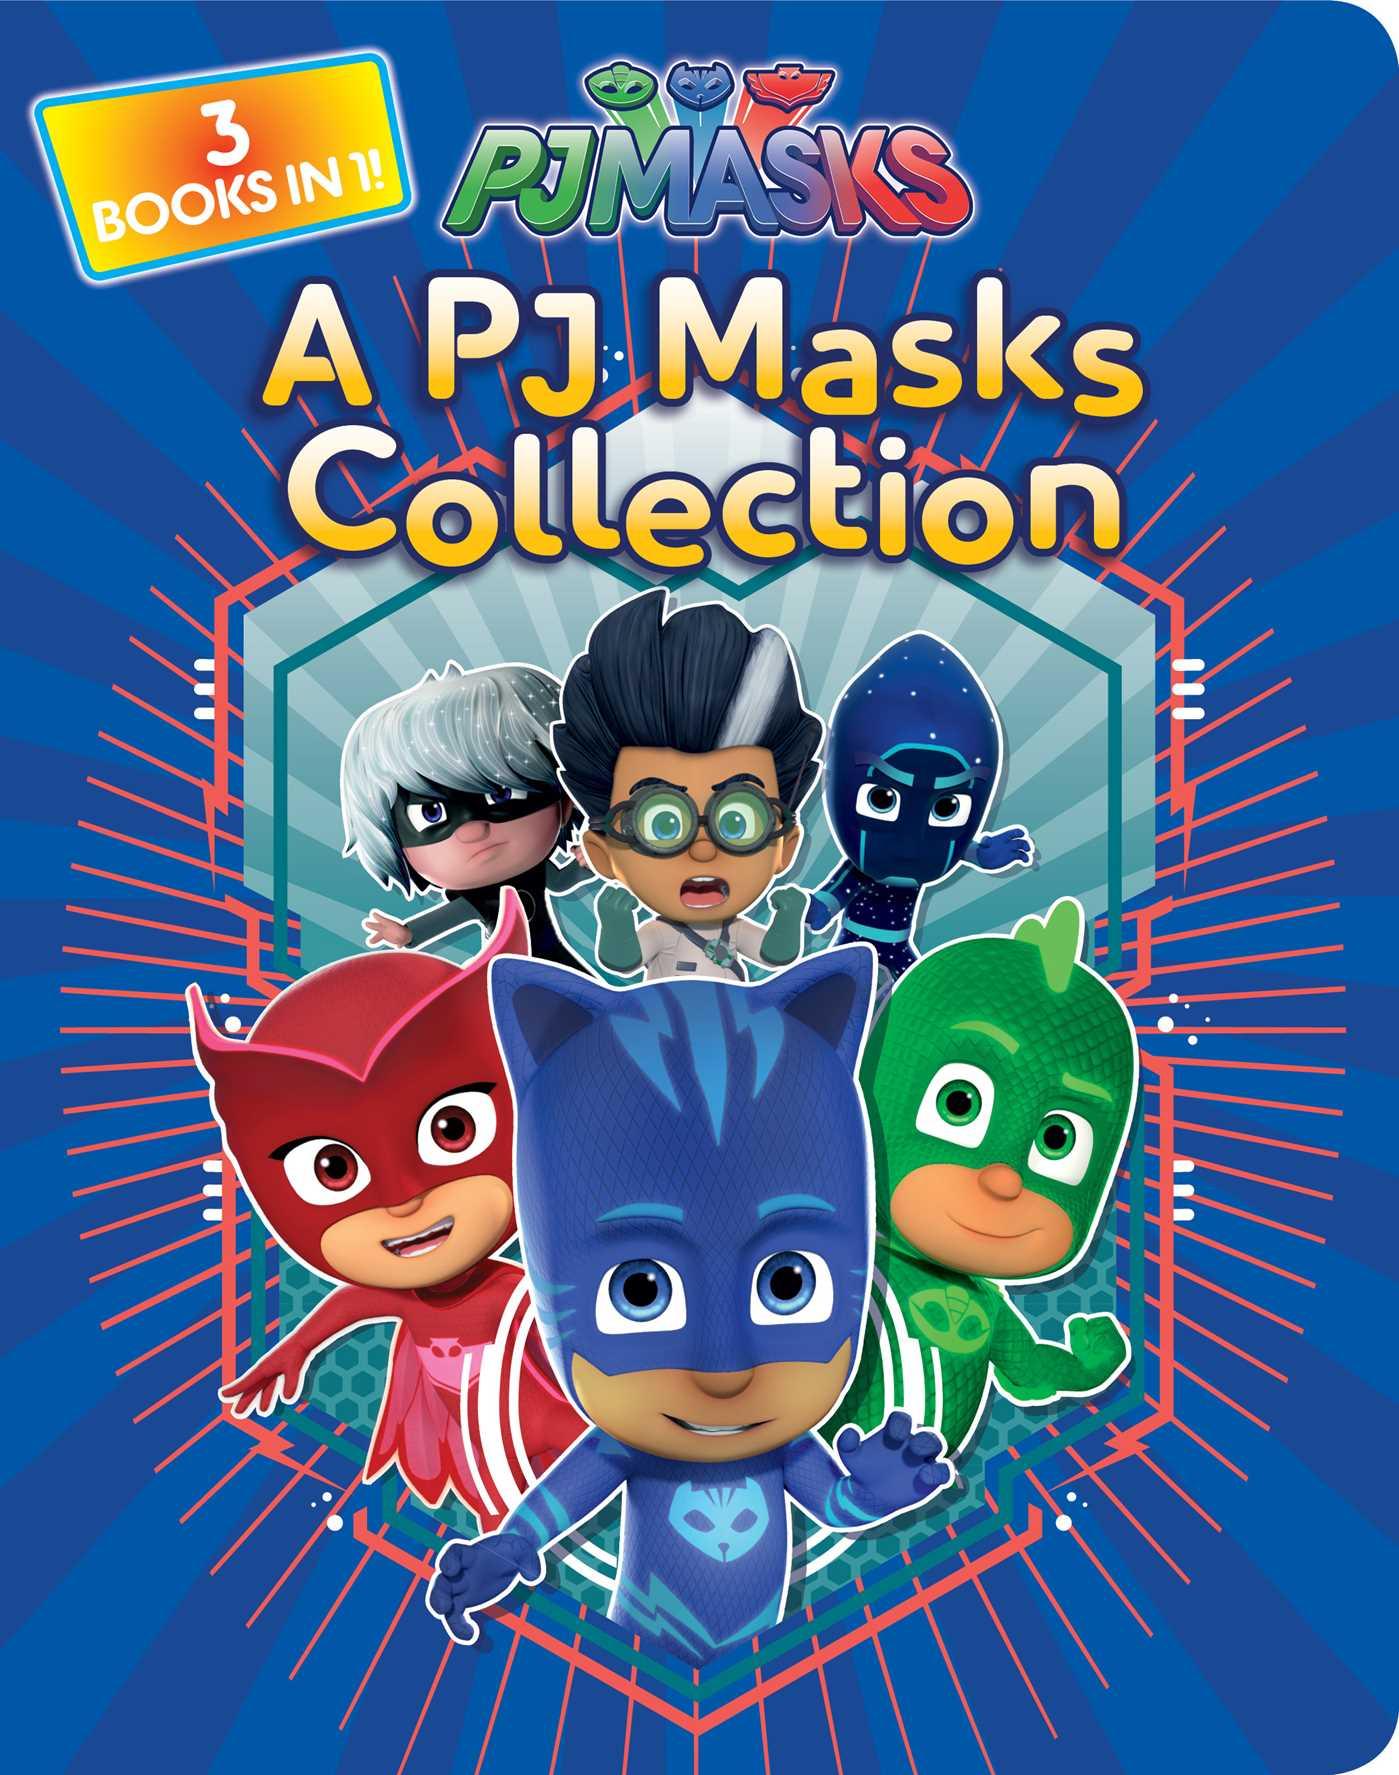 The pj masks collection 9781534433663 hr